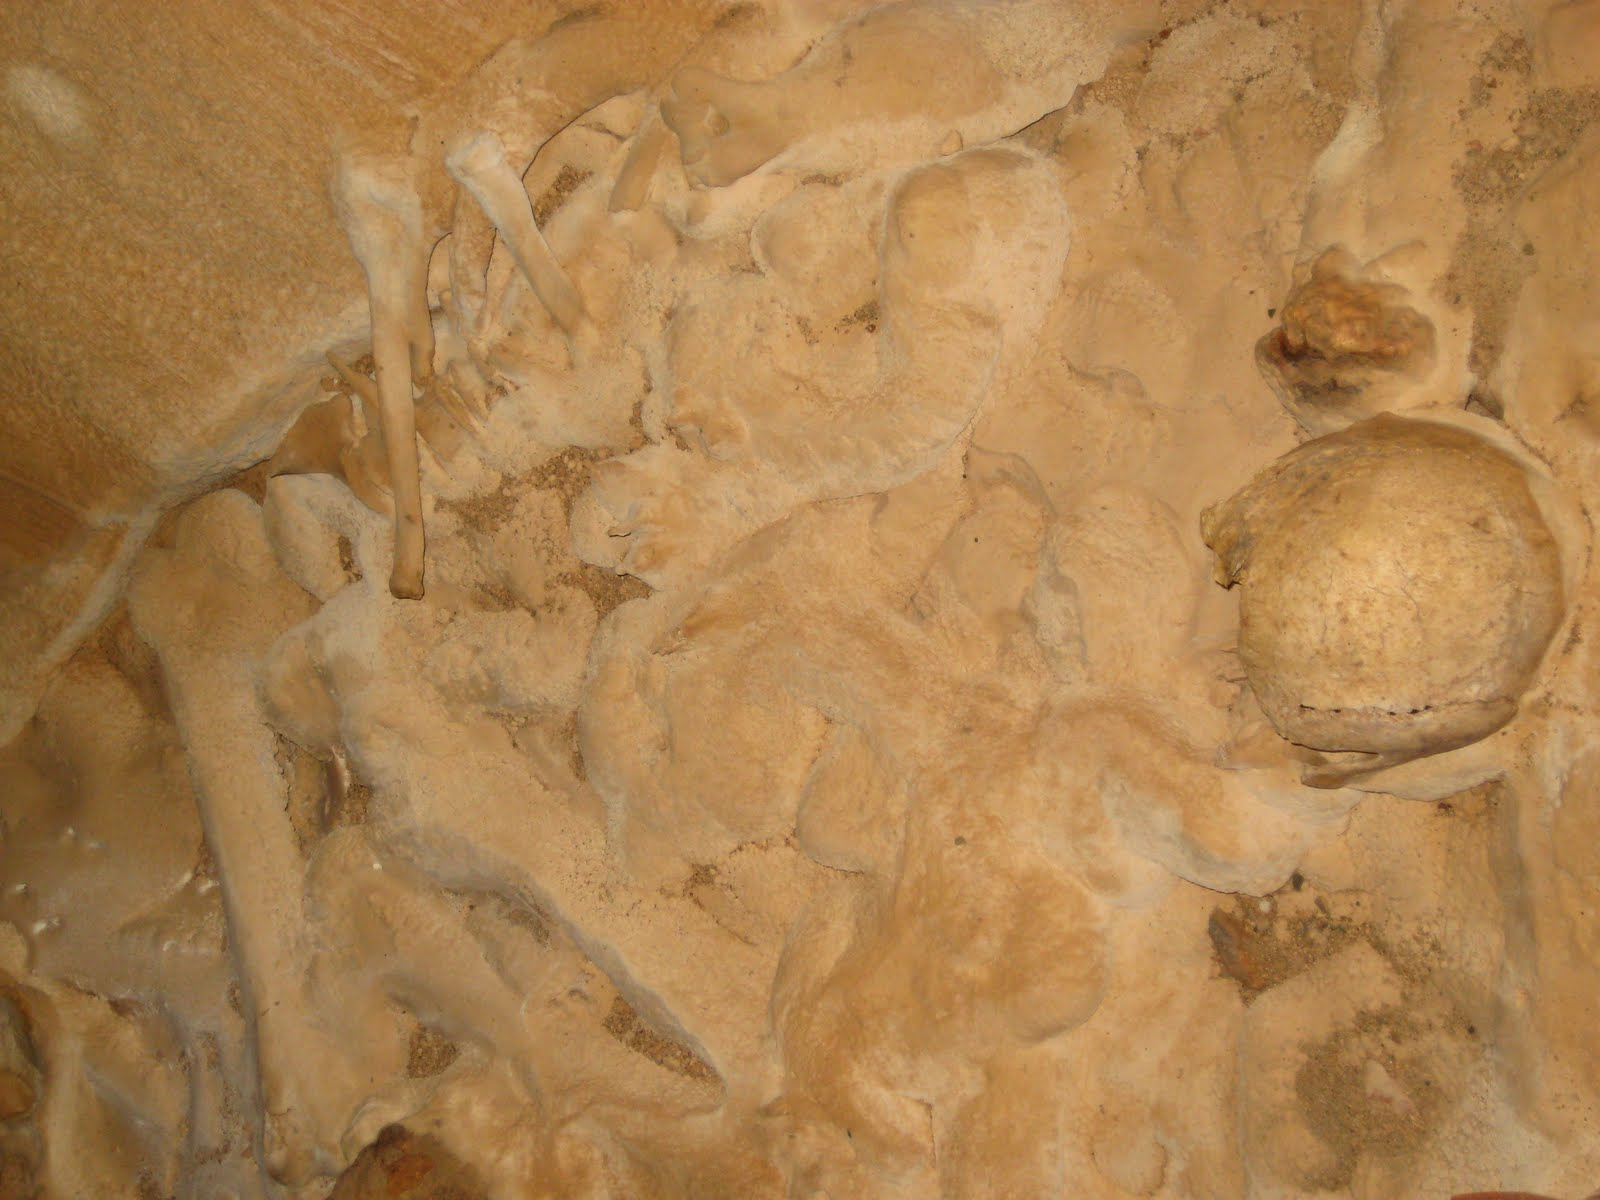 Uma descida ao inframundo na GRUTA MAIA Actun Tunichil Muknal (ATM)   Belize